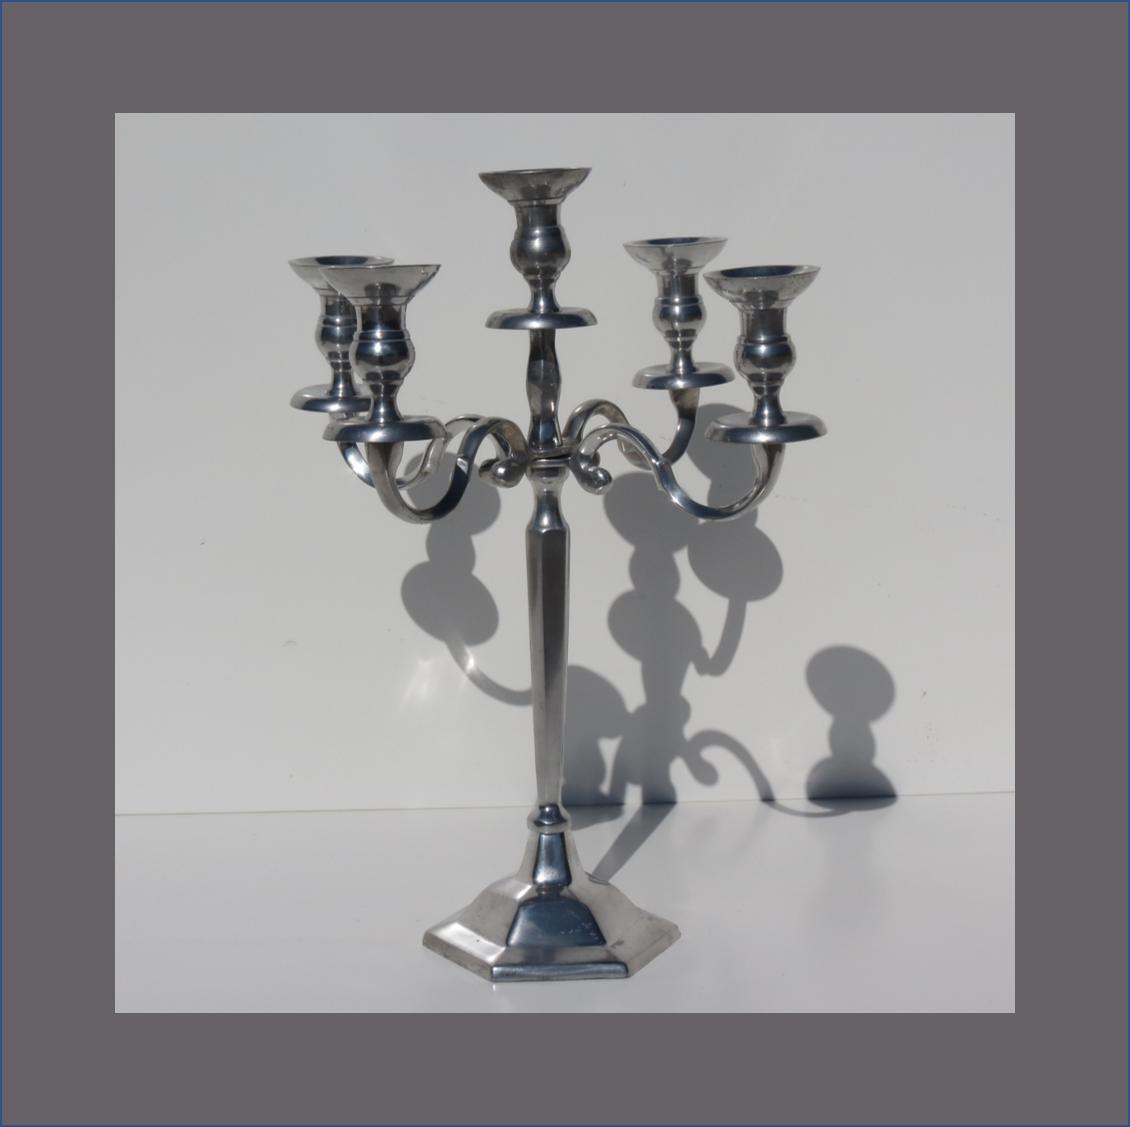 5-arm-silver-candelabra-small